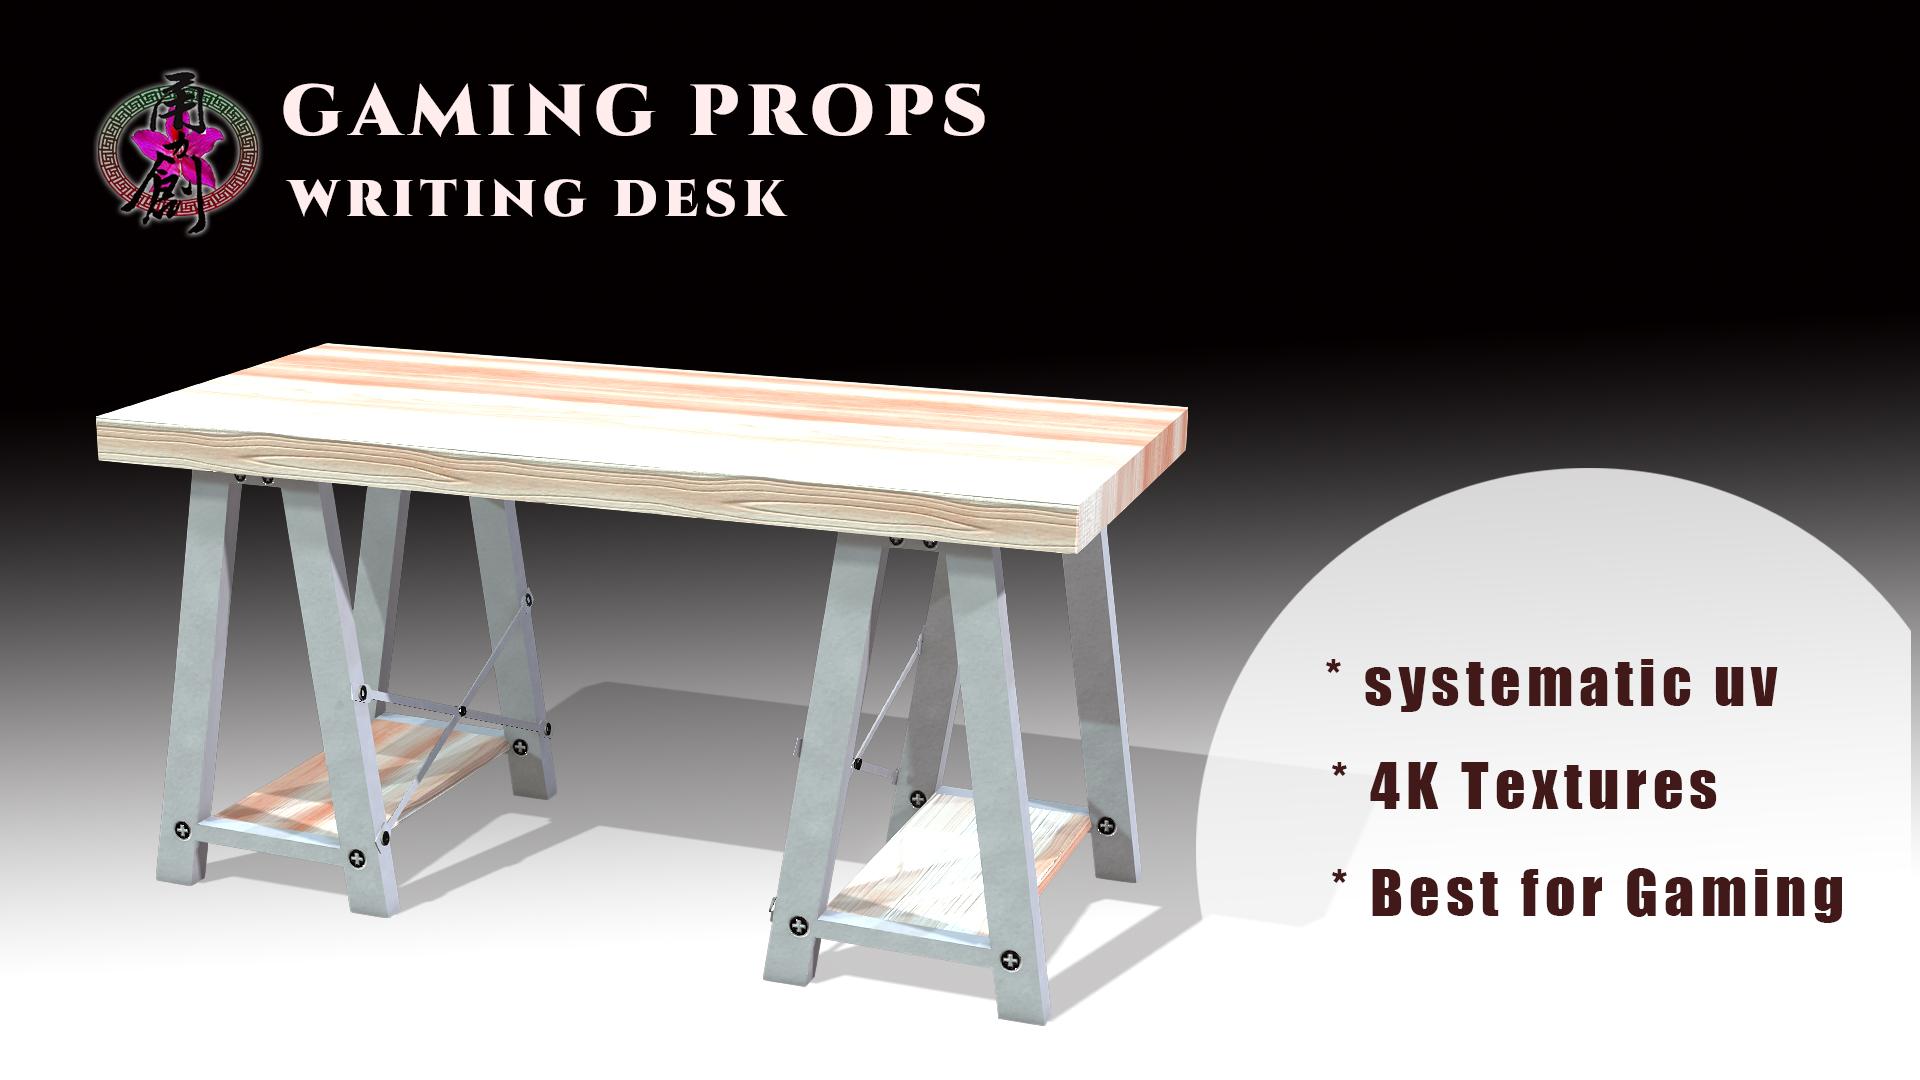 GamingProps-WritingDesk-Poster01